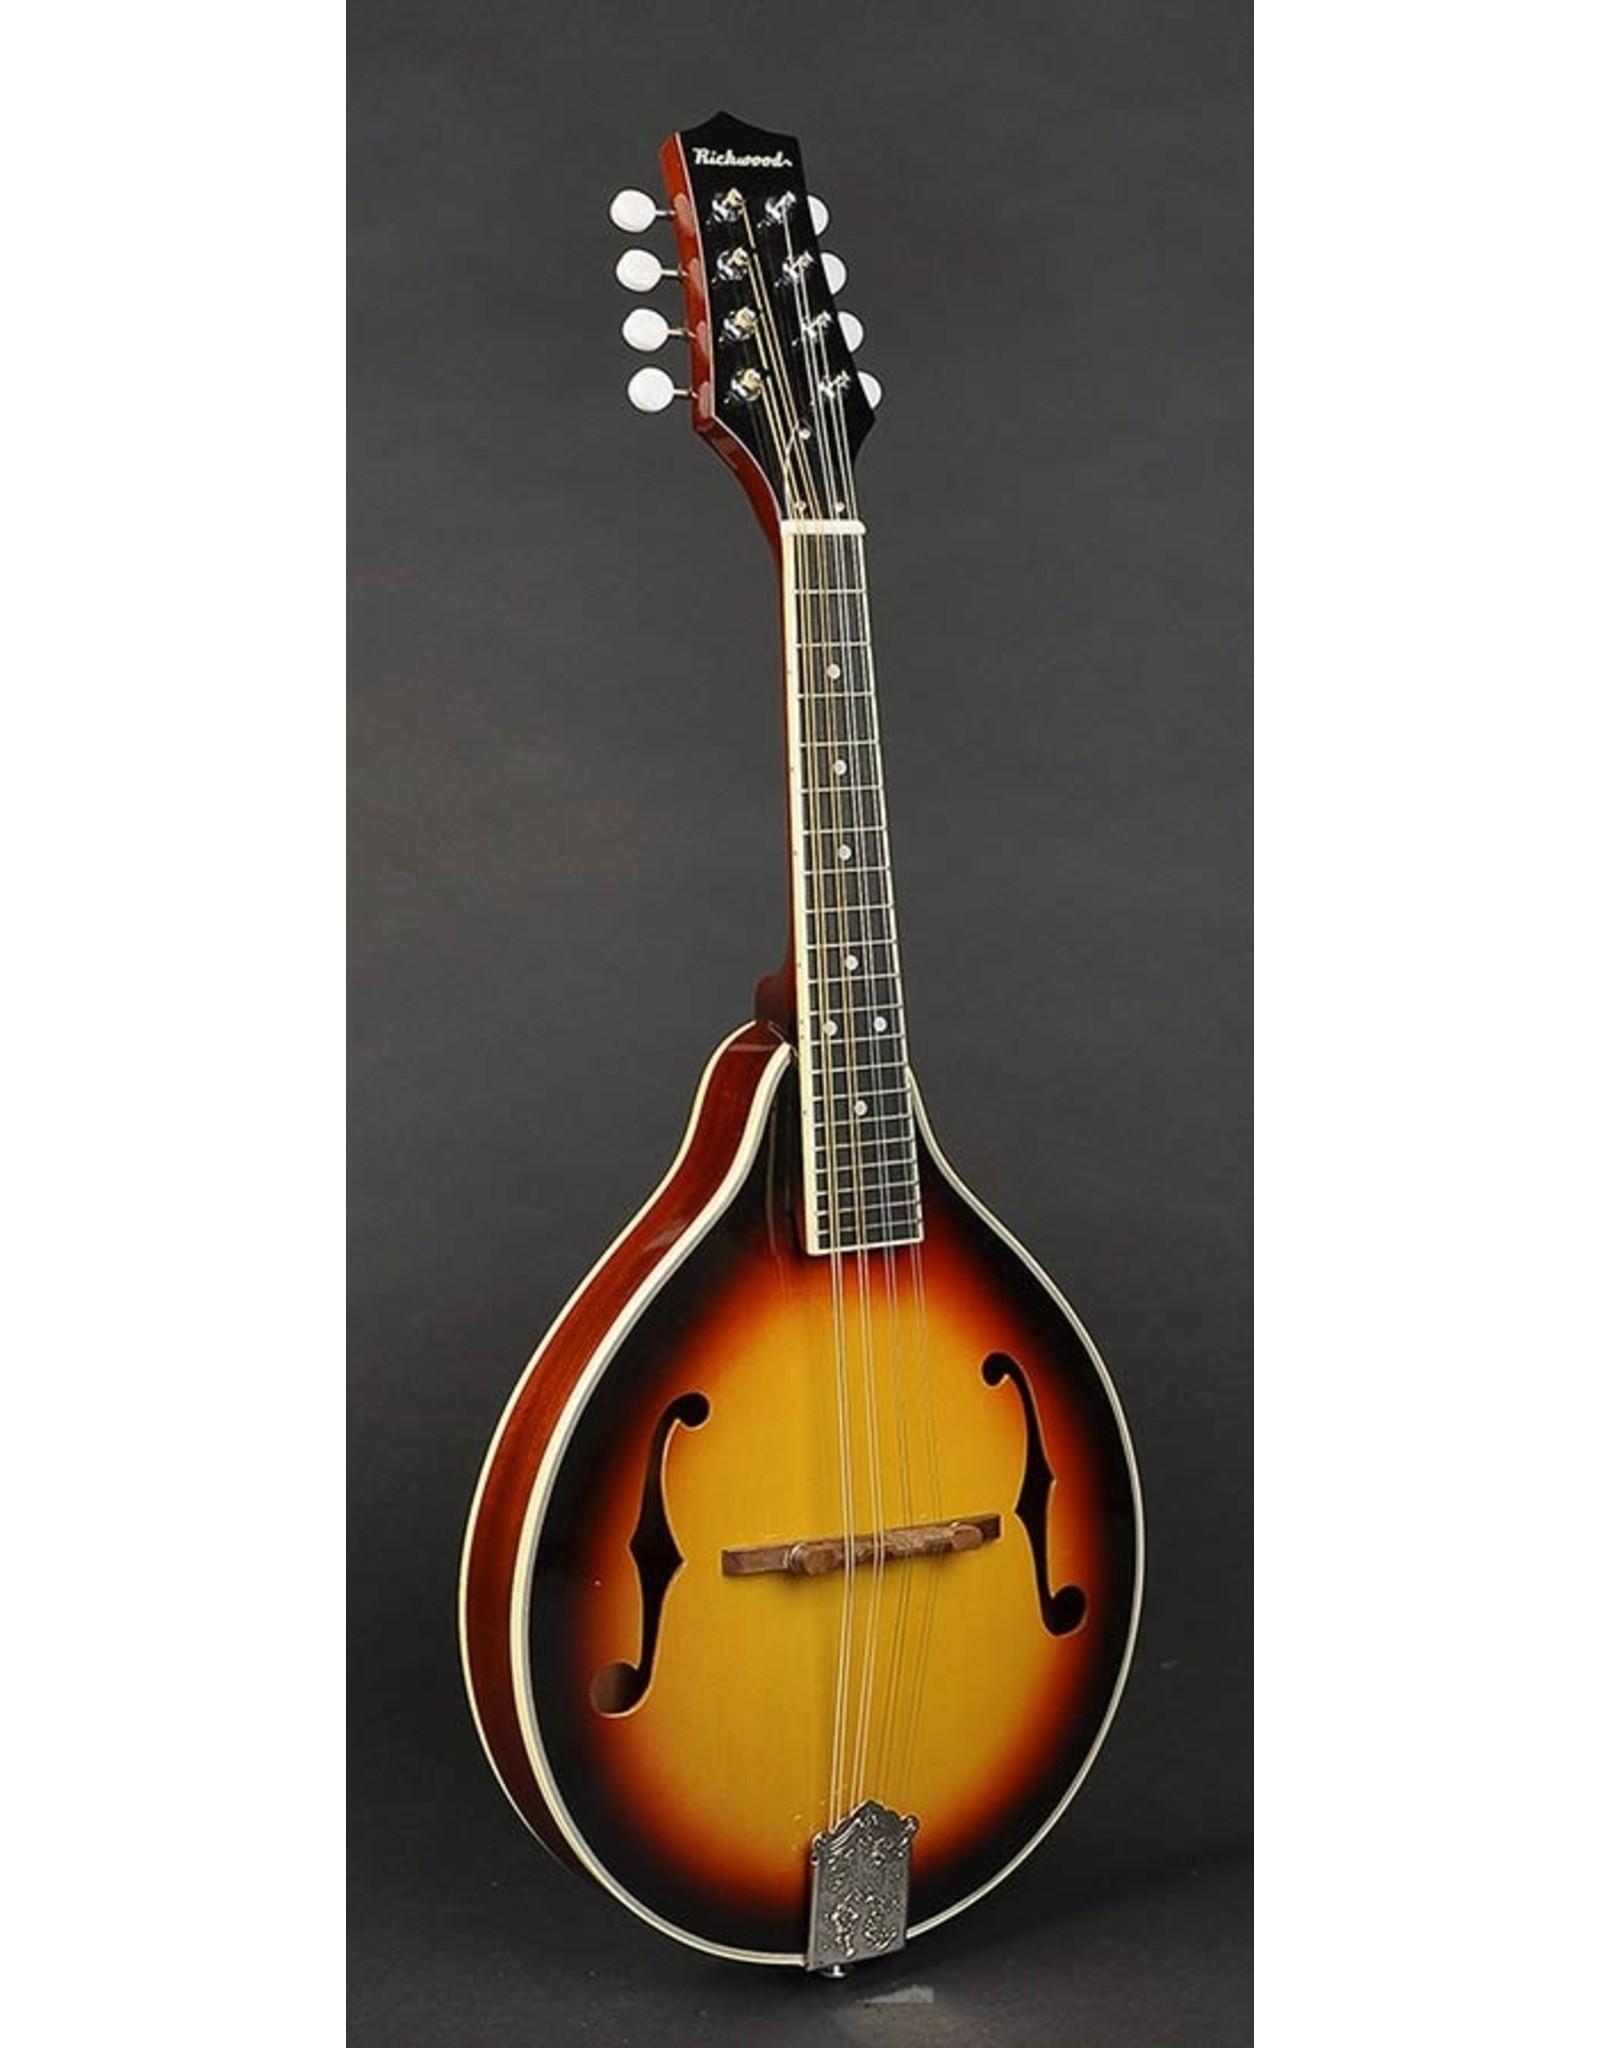 Richwood Richwood RMA 60 VS Master Series mandoline A-style